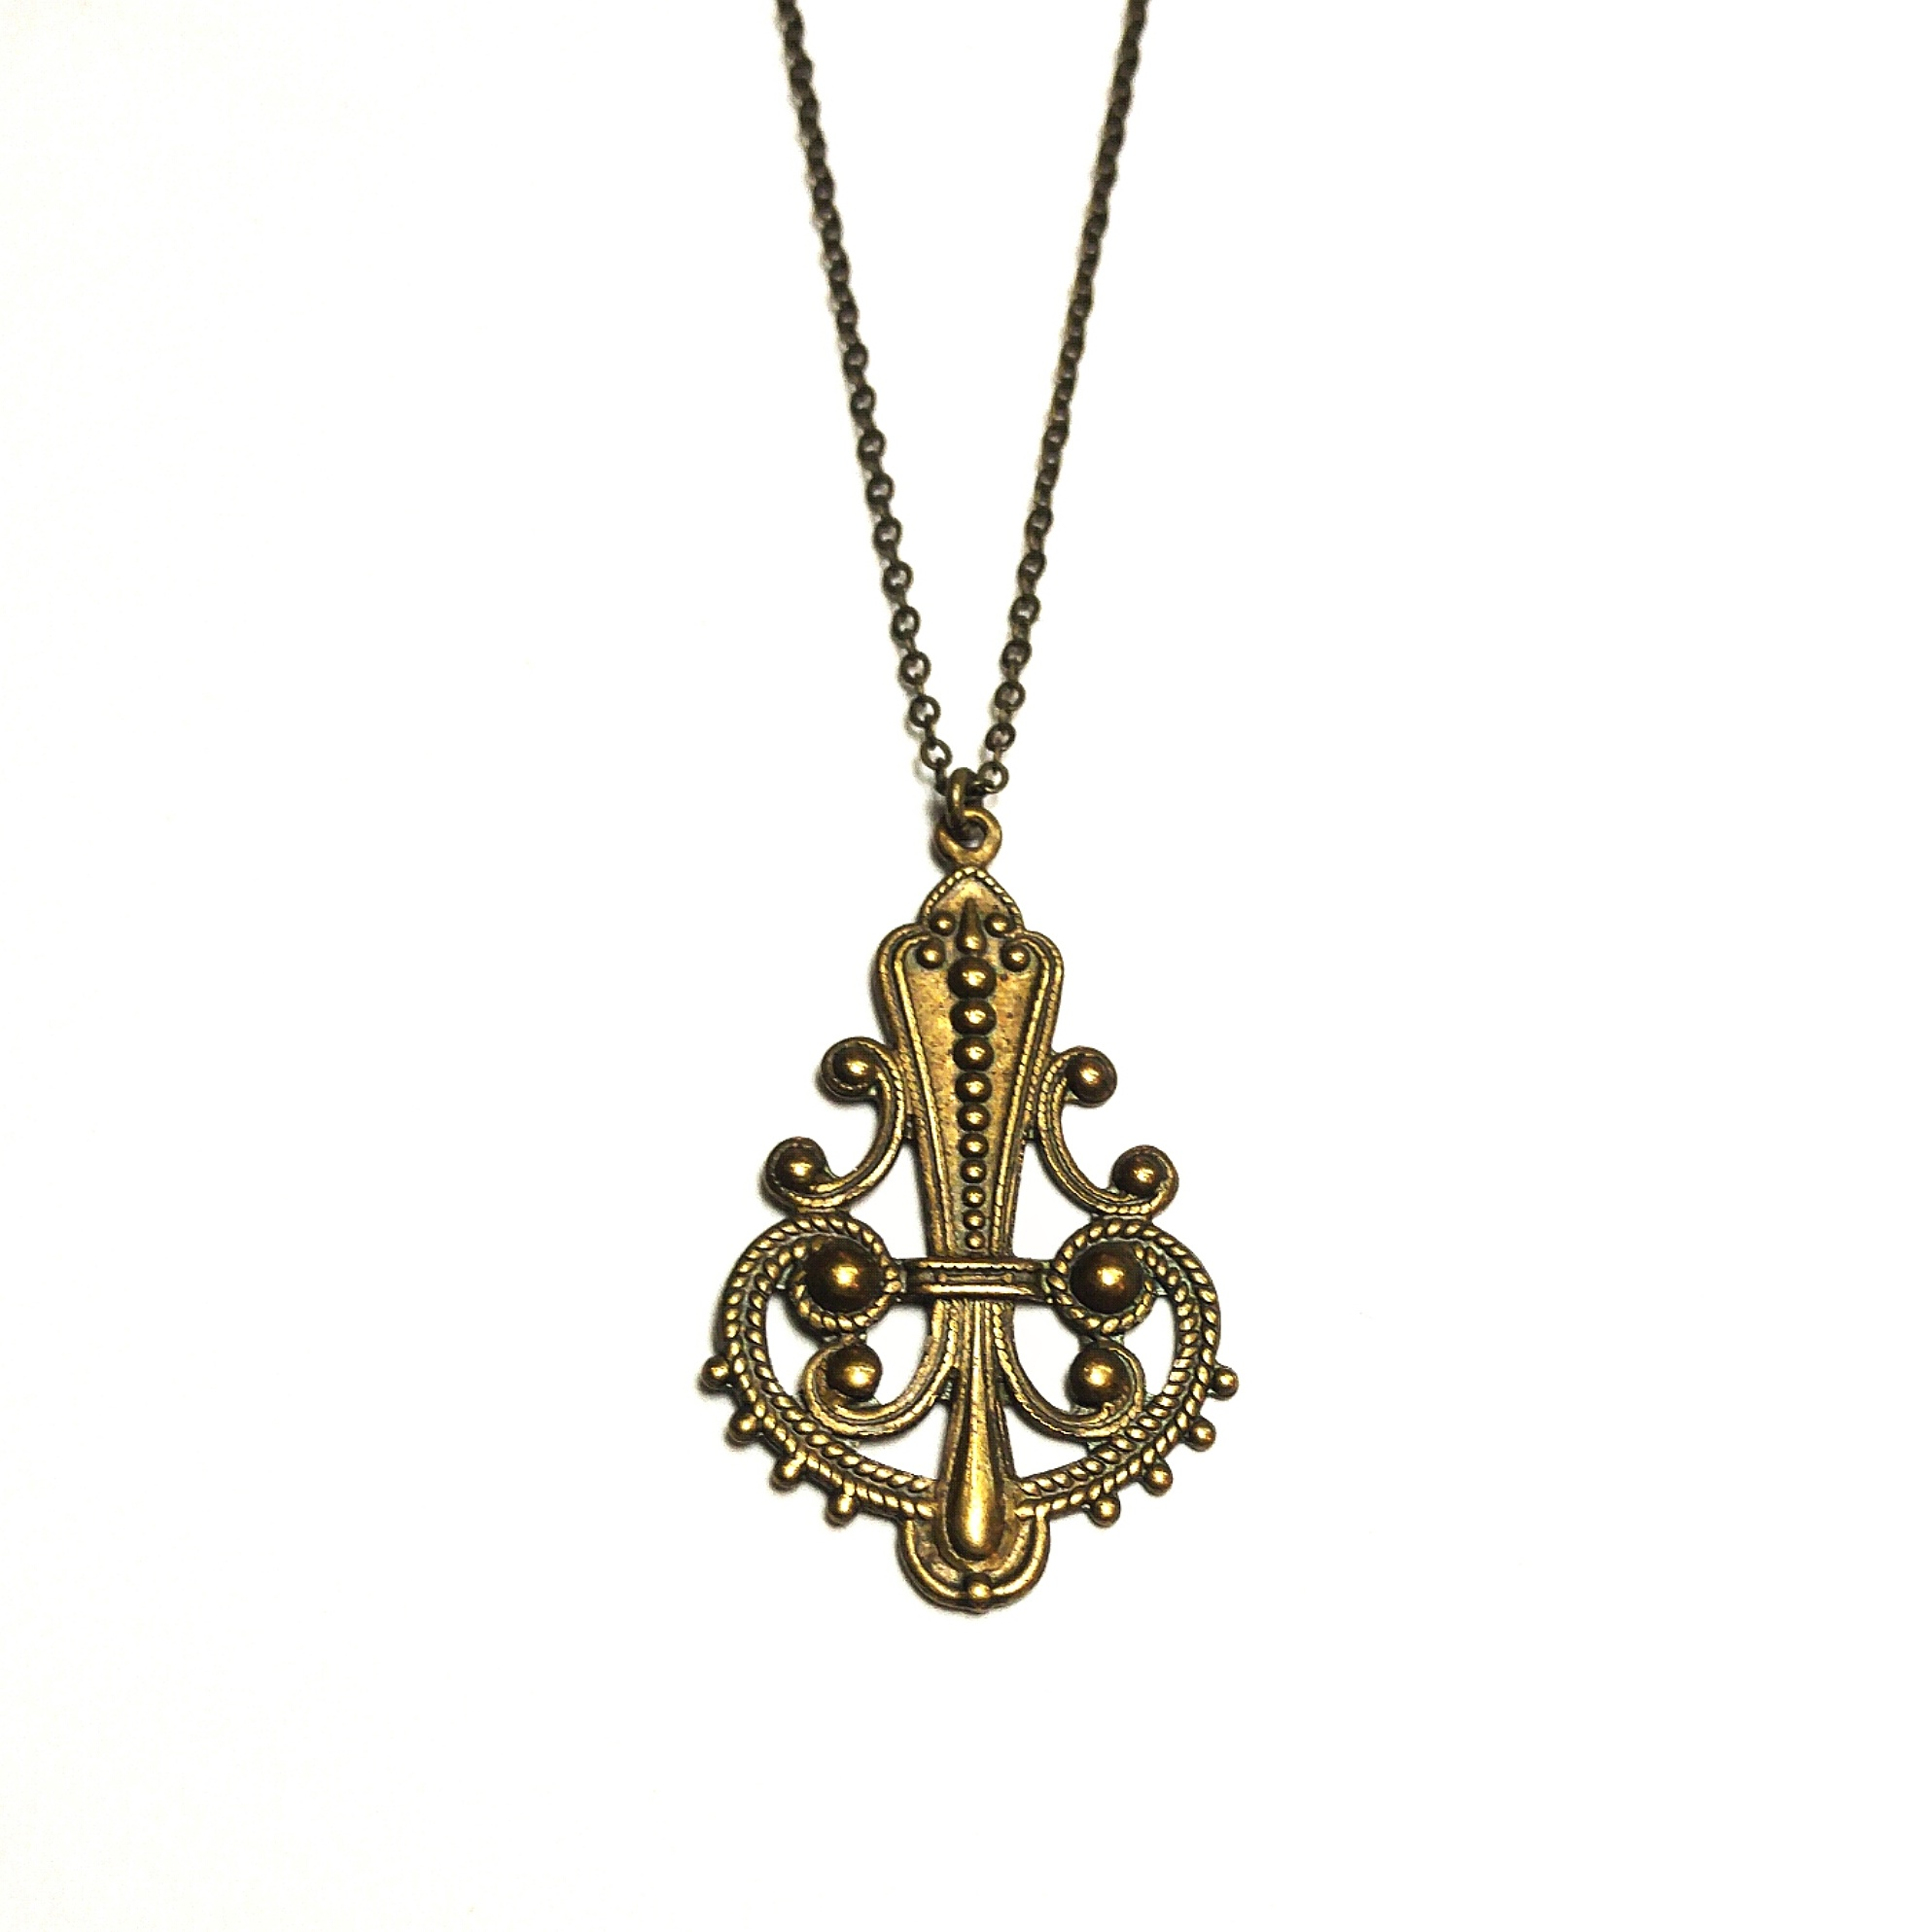 Detailed brass pendant